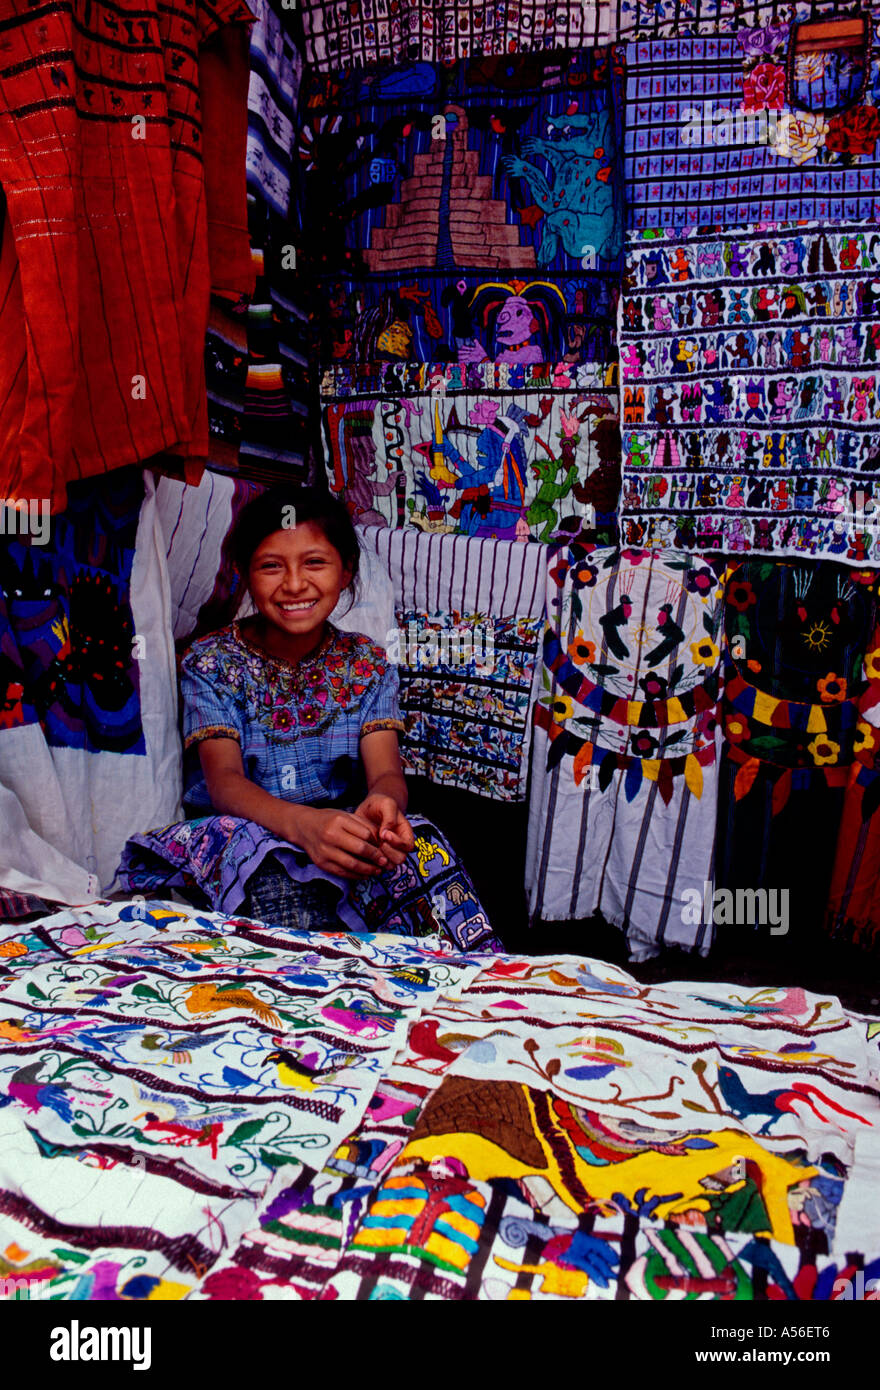 1, one, Guatemalan girl, Mayan girl, teenage girl, vendor, selling textiles, market stall, marketplace, Santiago Atitlan, Guatemala, Central America - Stock Image